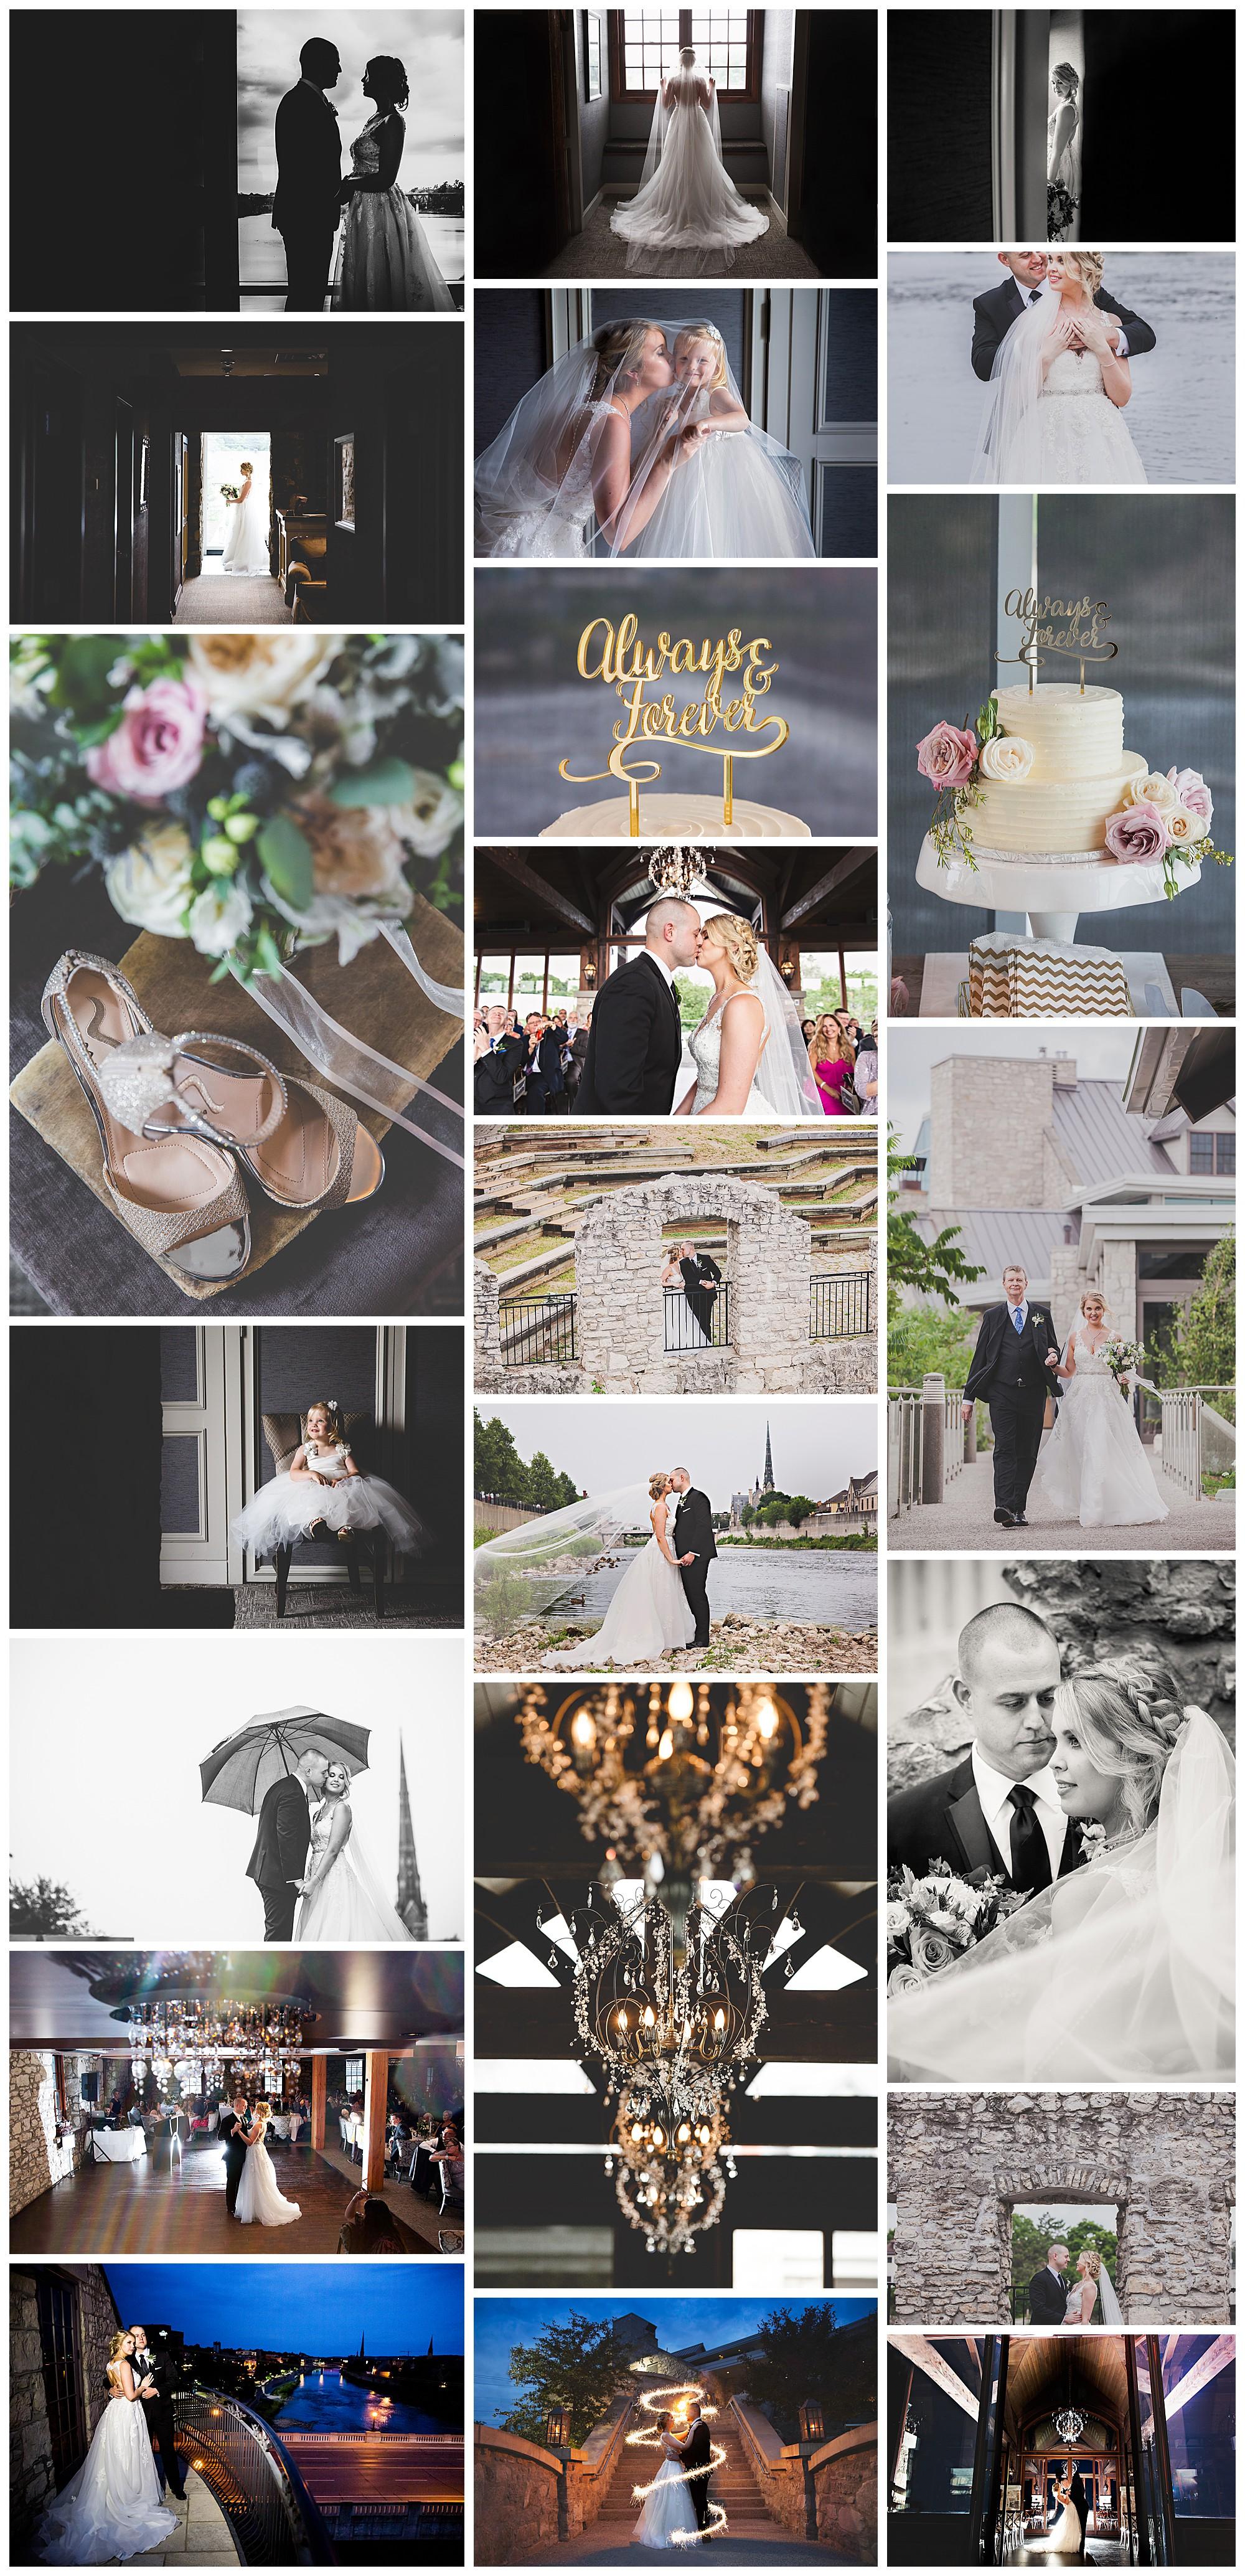 Cambridge Mill, Cambridge, Ontario wedding photos by VanDaele & Russell